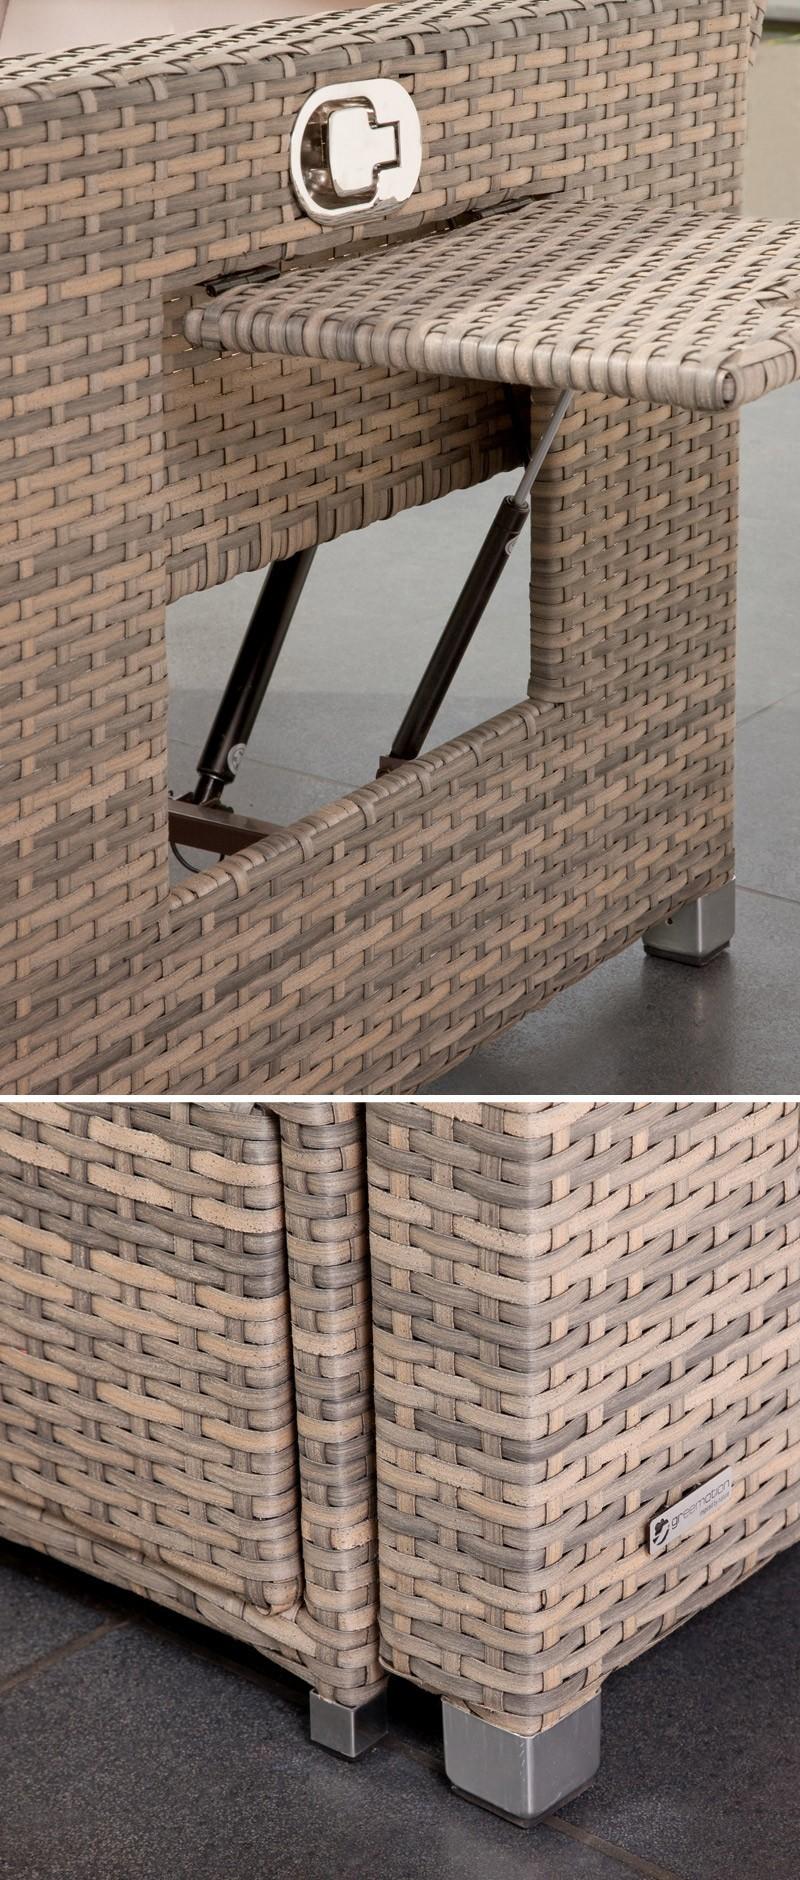 Gartensofa / Lounge Liege Bahia Twin greemotion Polyrattan grau Bild 2